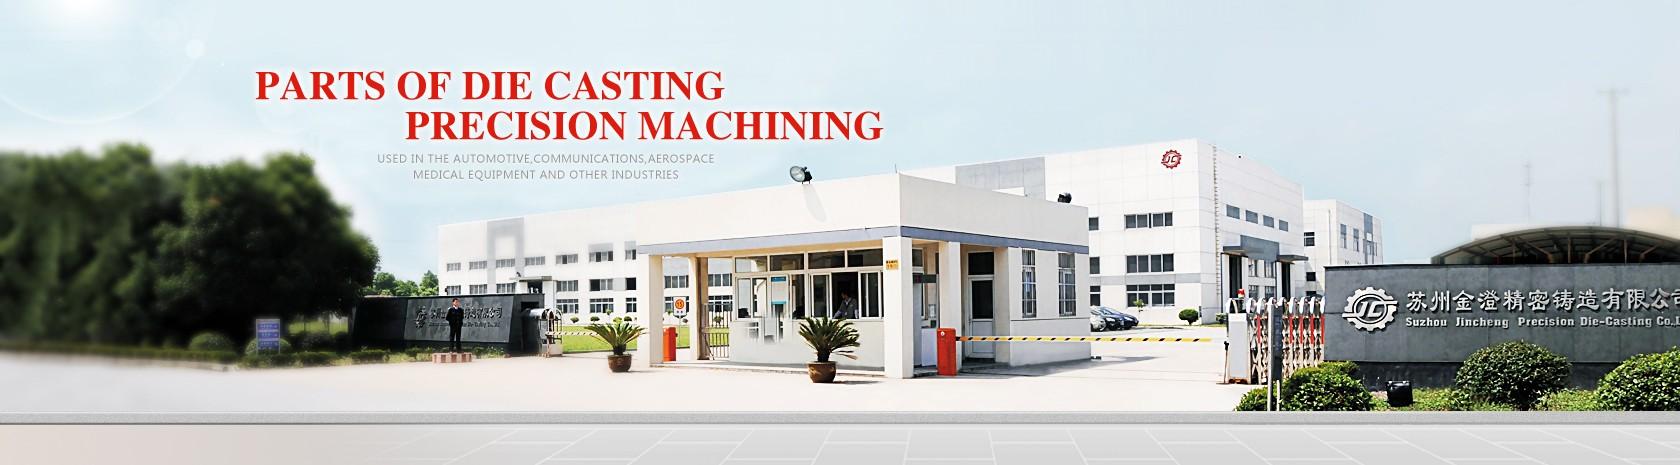 Suzhou JinCheng Precision Die Casting Co ,Ltd | LinkedIn